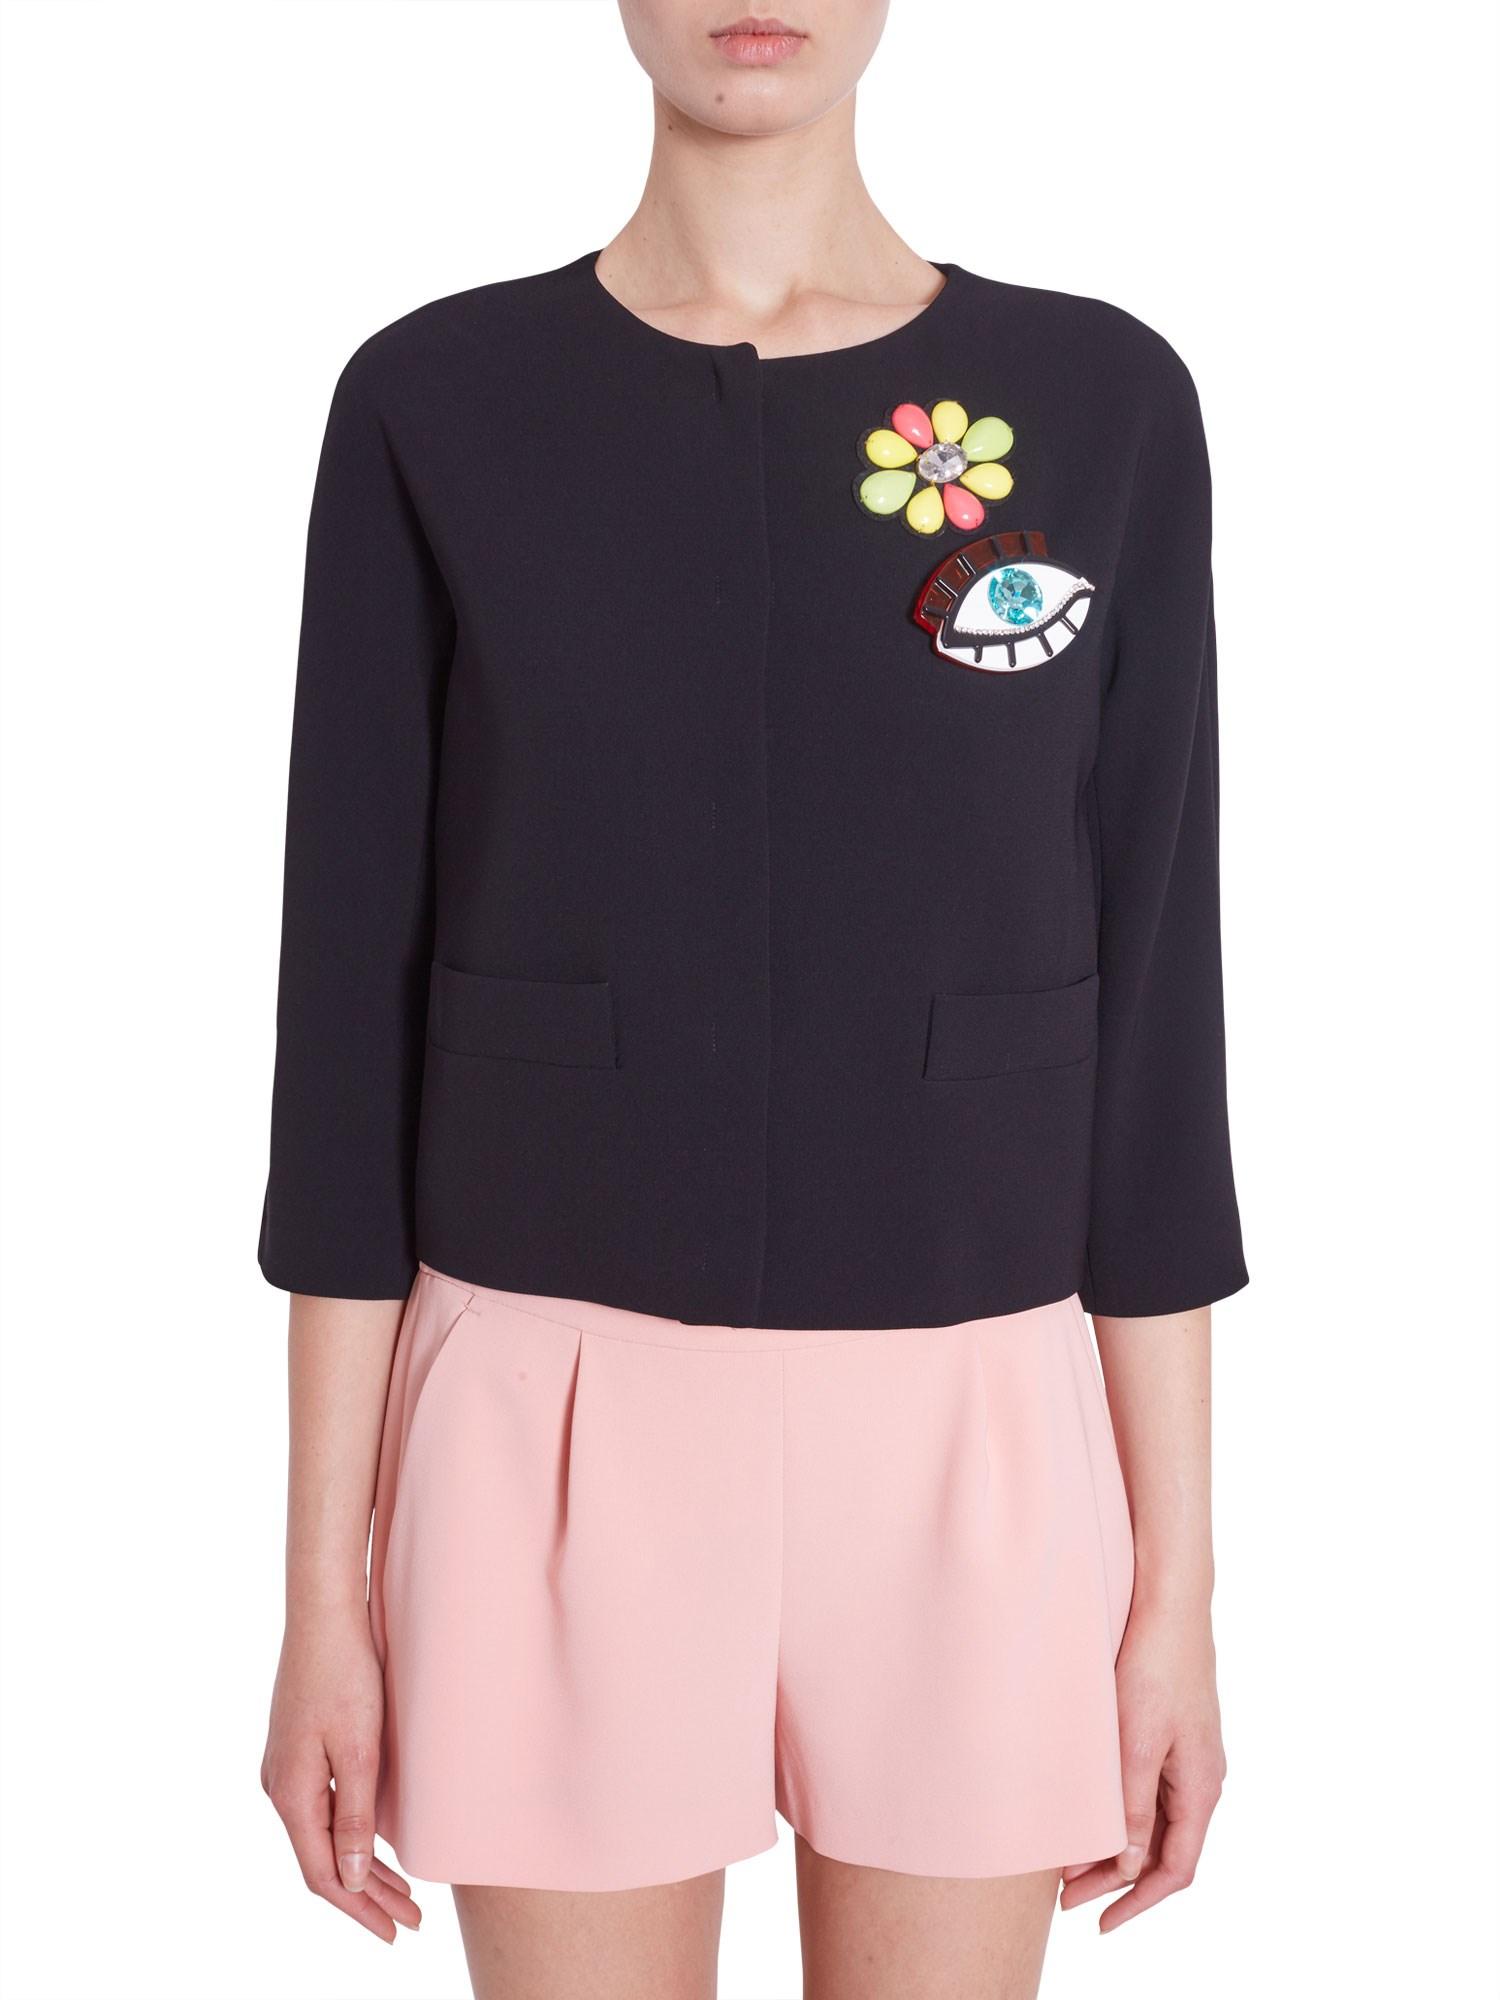 Boutique moschino crêpe jacket - boutique moschino - Modalova